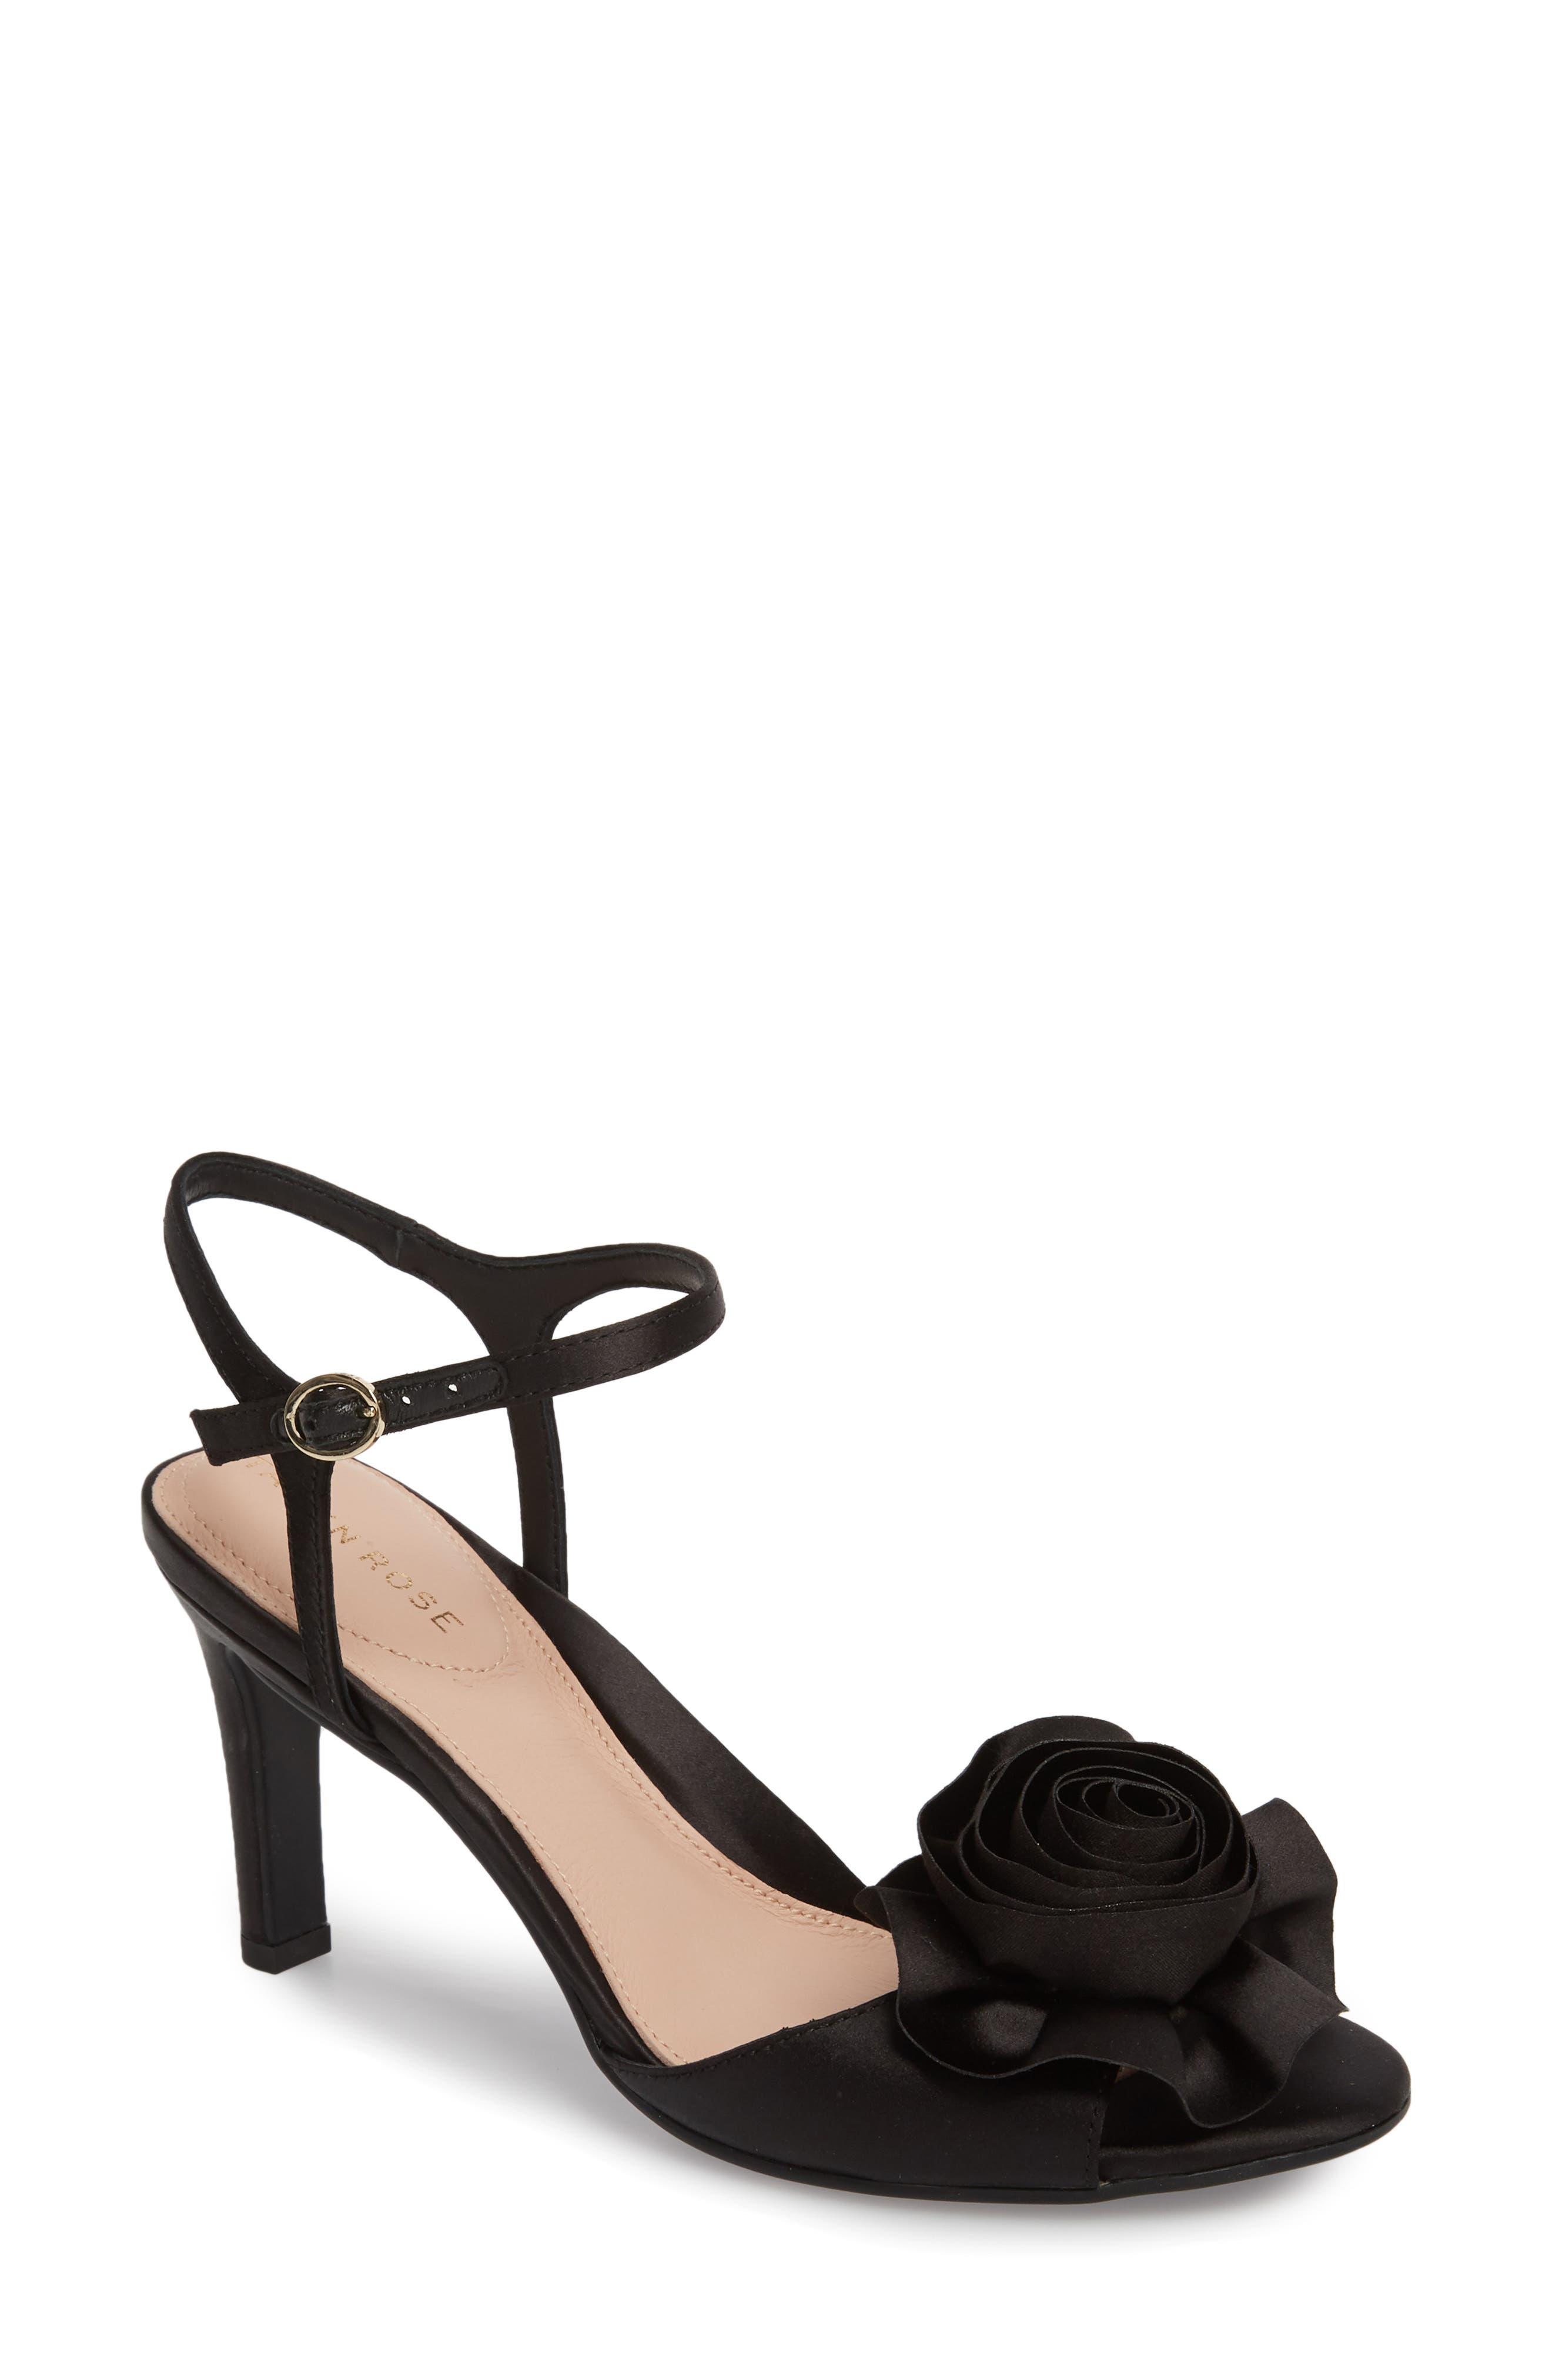 Jacklyn Flower Sandal,                             Main thumbnail 1, color,                             BLACK SHIMMER FABRIC